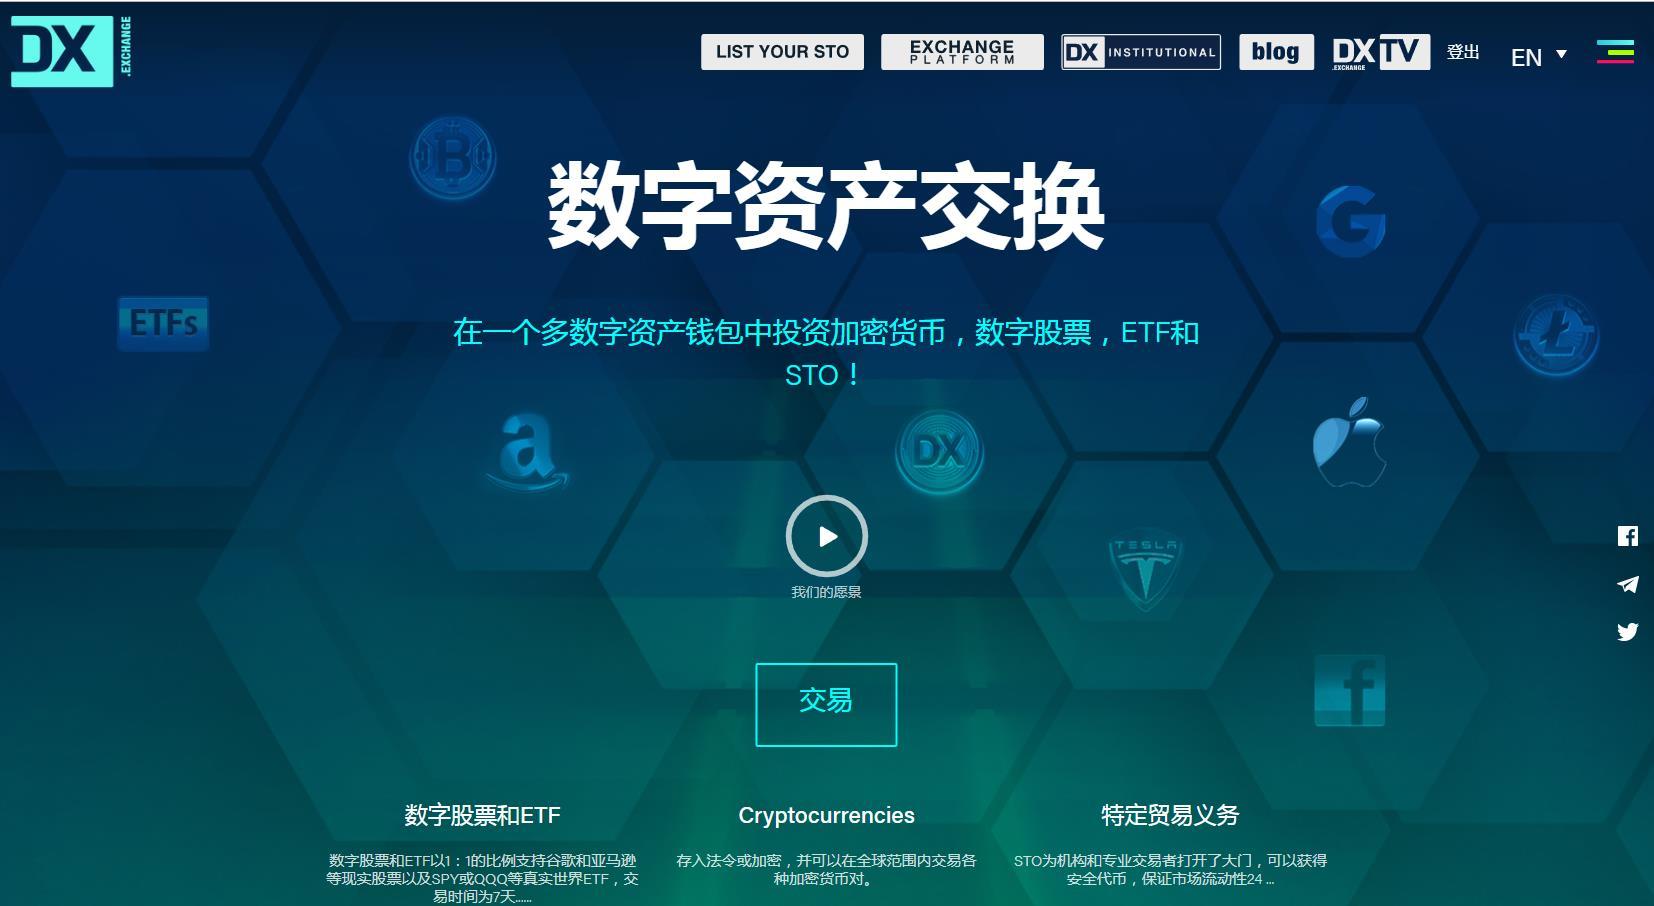 DX.Exchange首家合规STO挂牌和证券型代币交易所